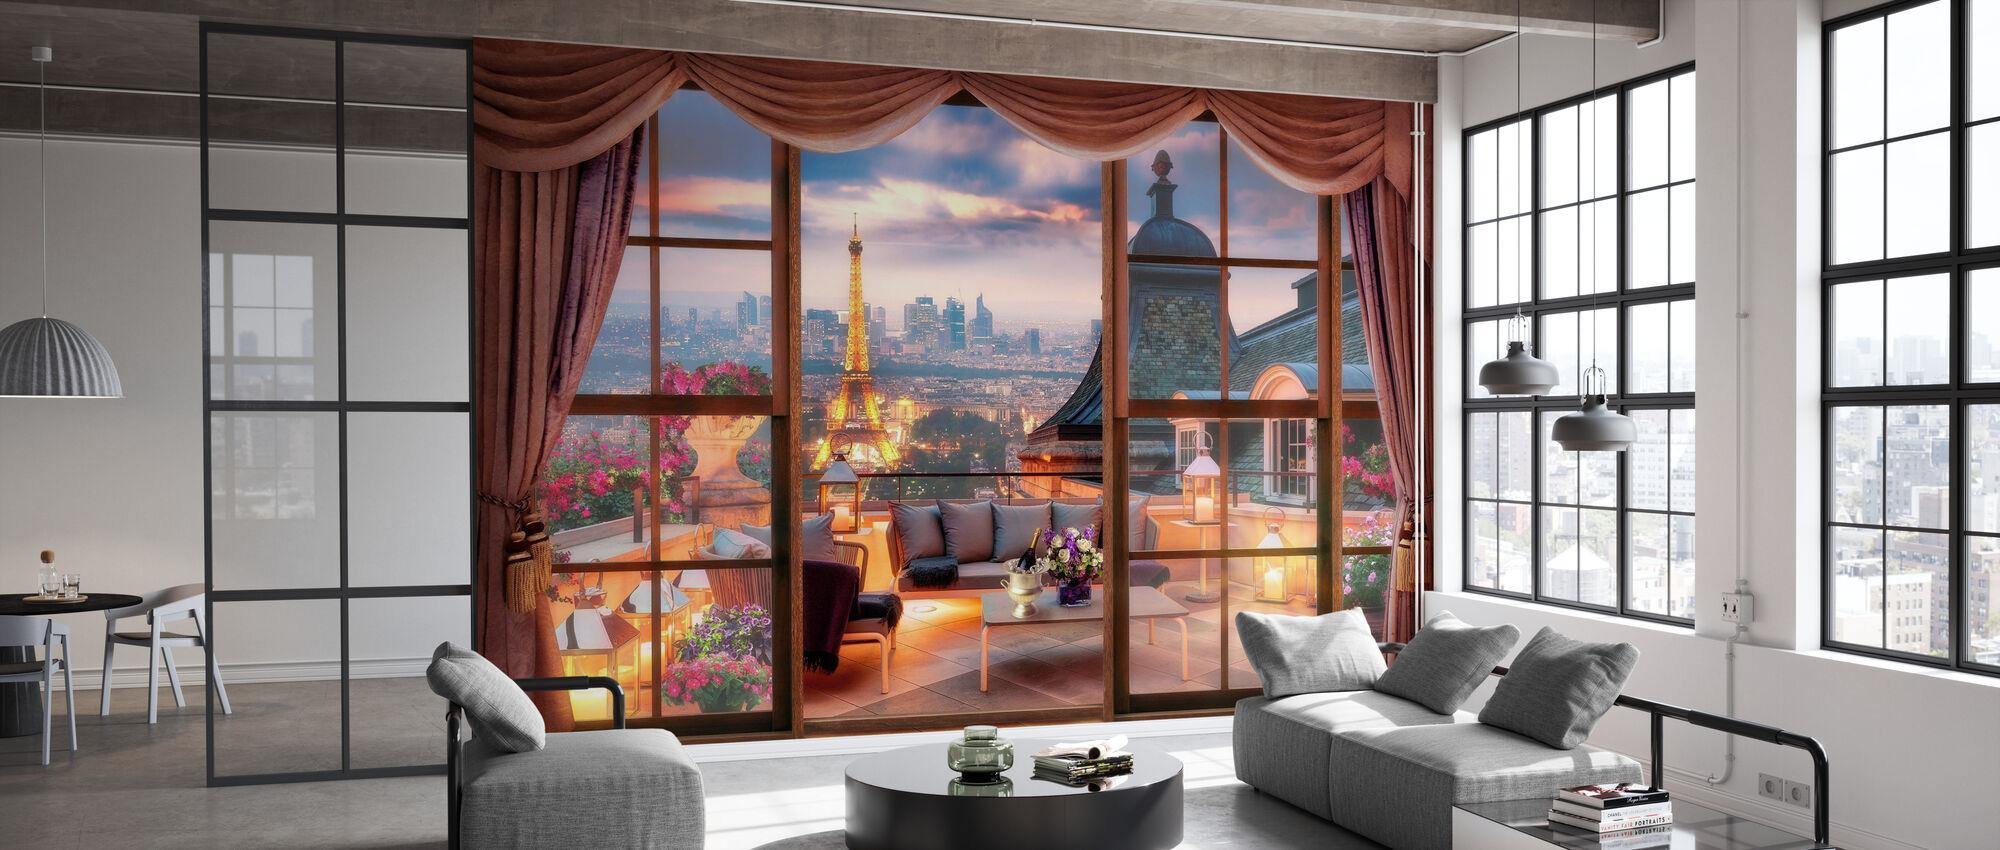 View over Paris - Wallpaper - Office